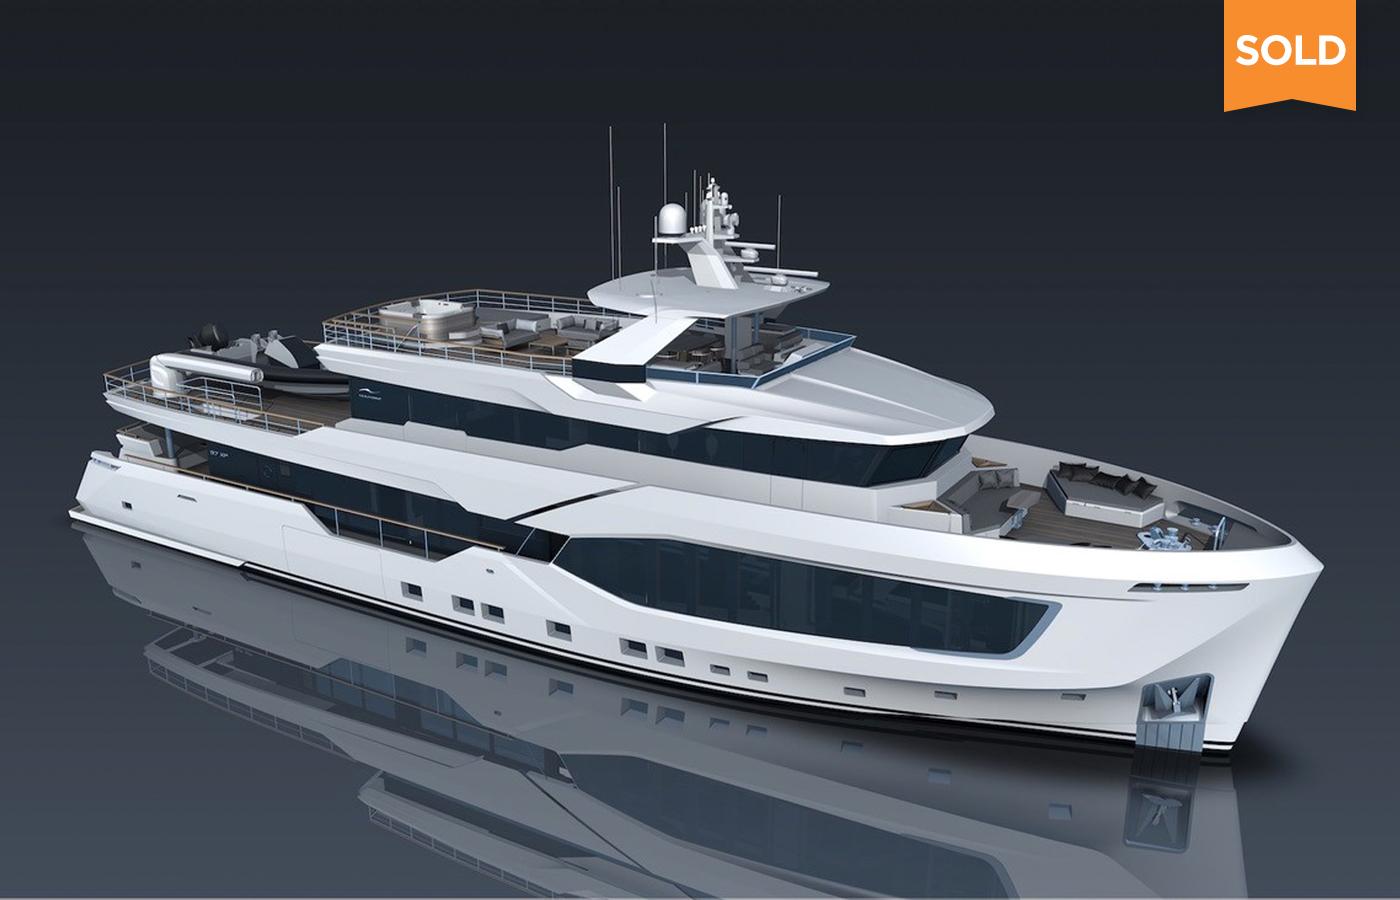 122 Numarine 37XP Expedition Yacht Sold By Alex Clarke